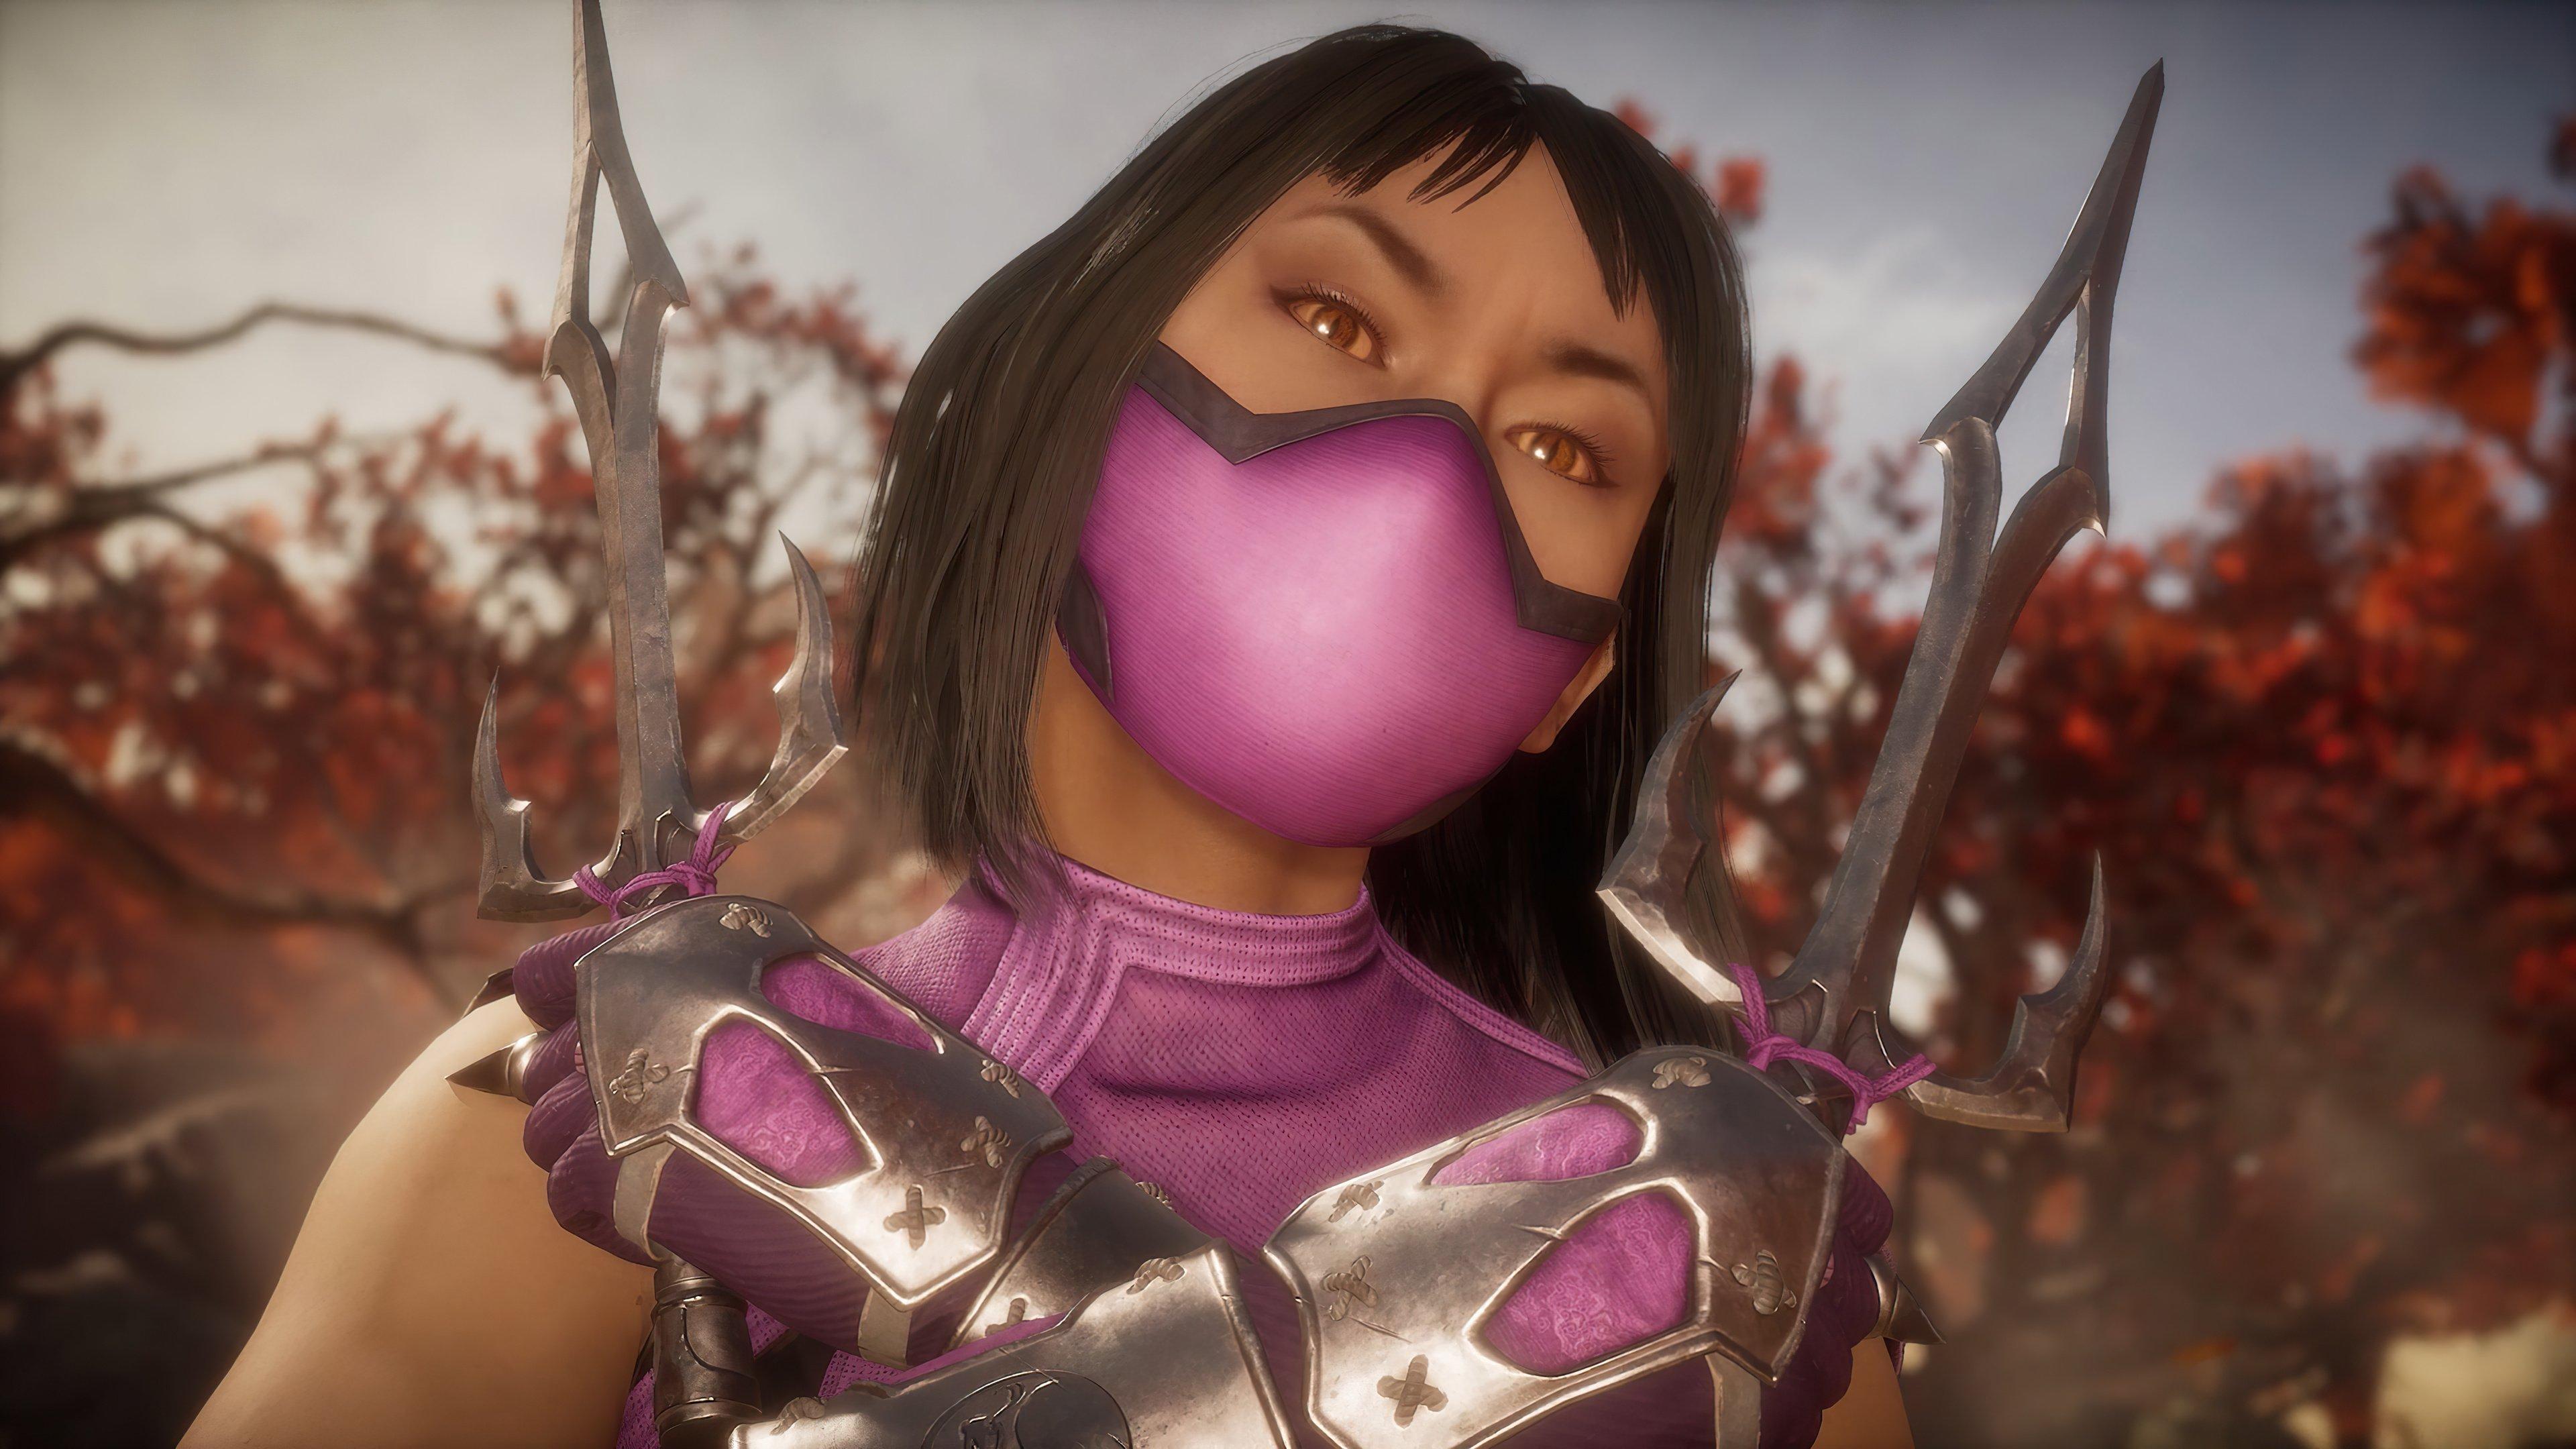 Fondos de pantalla Mileena de Mortal Kombat